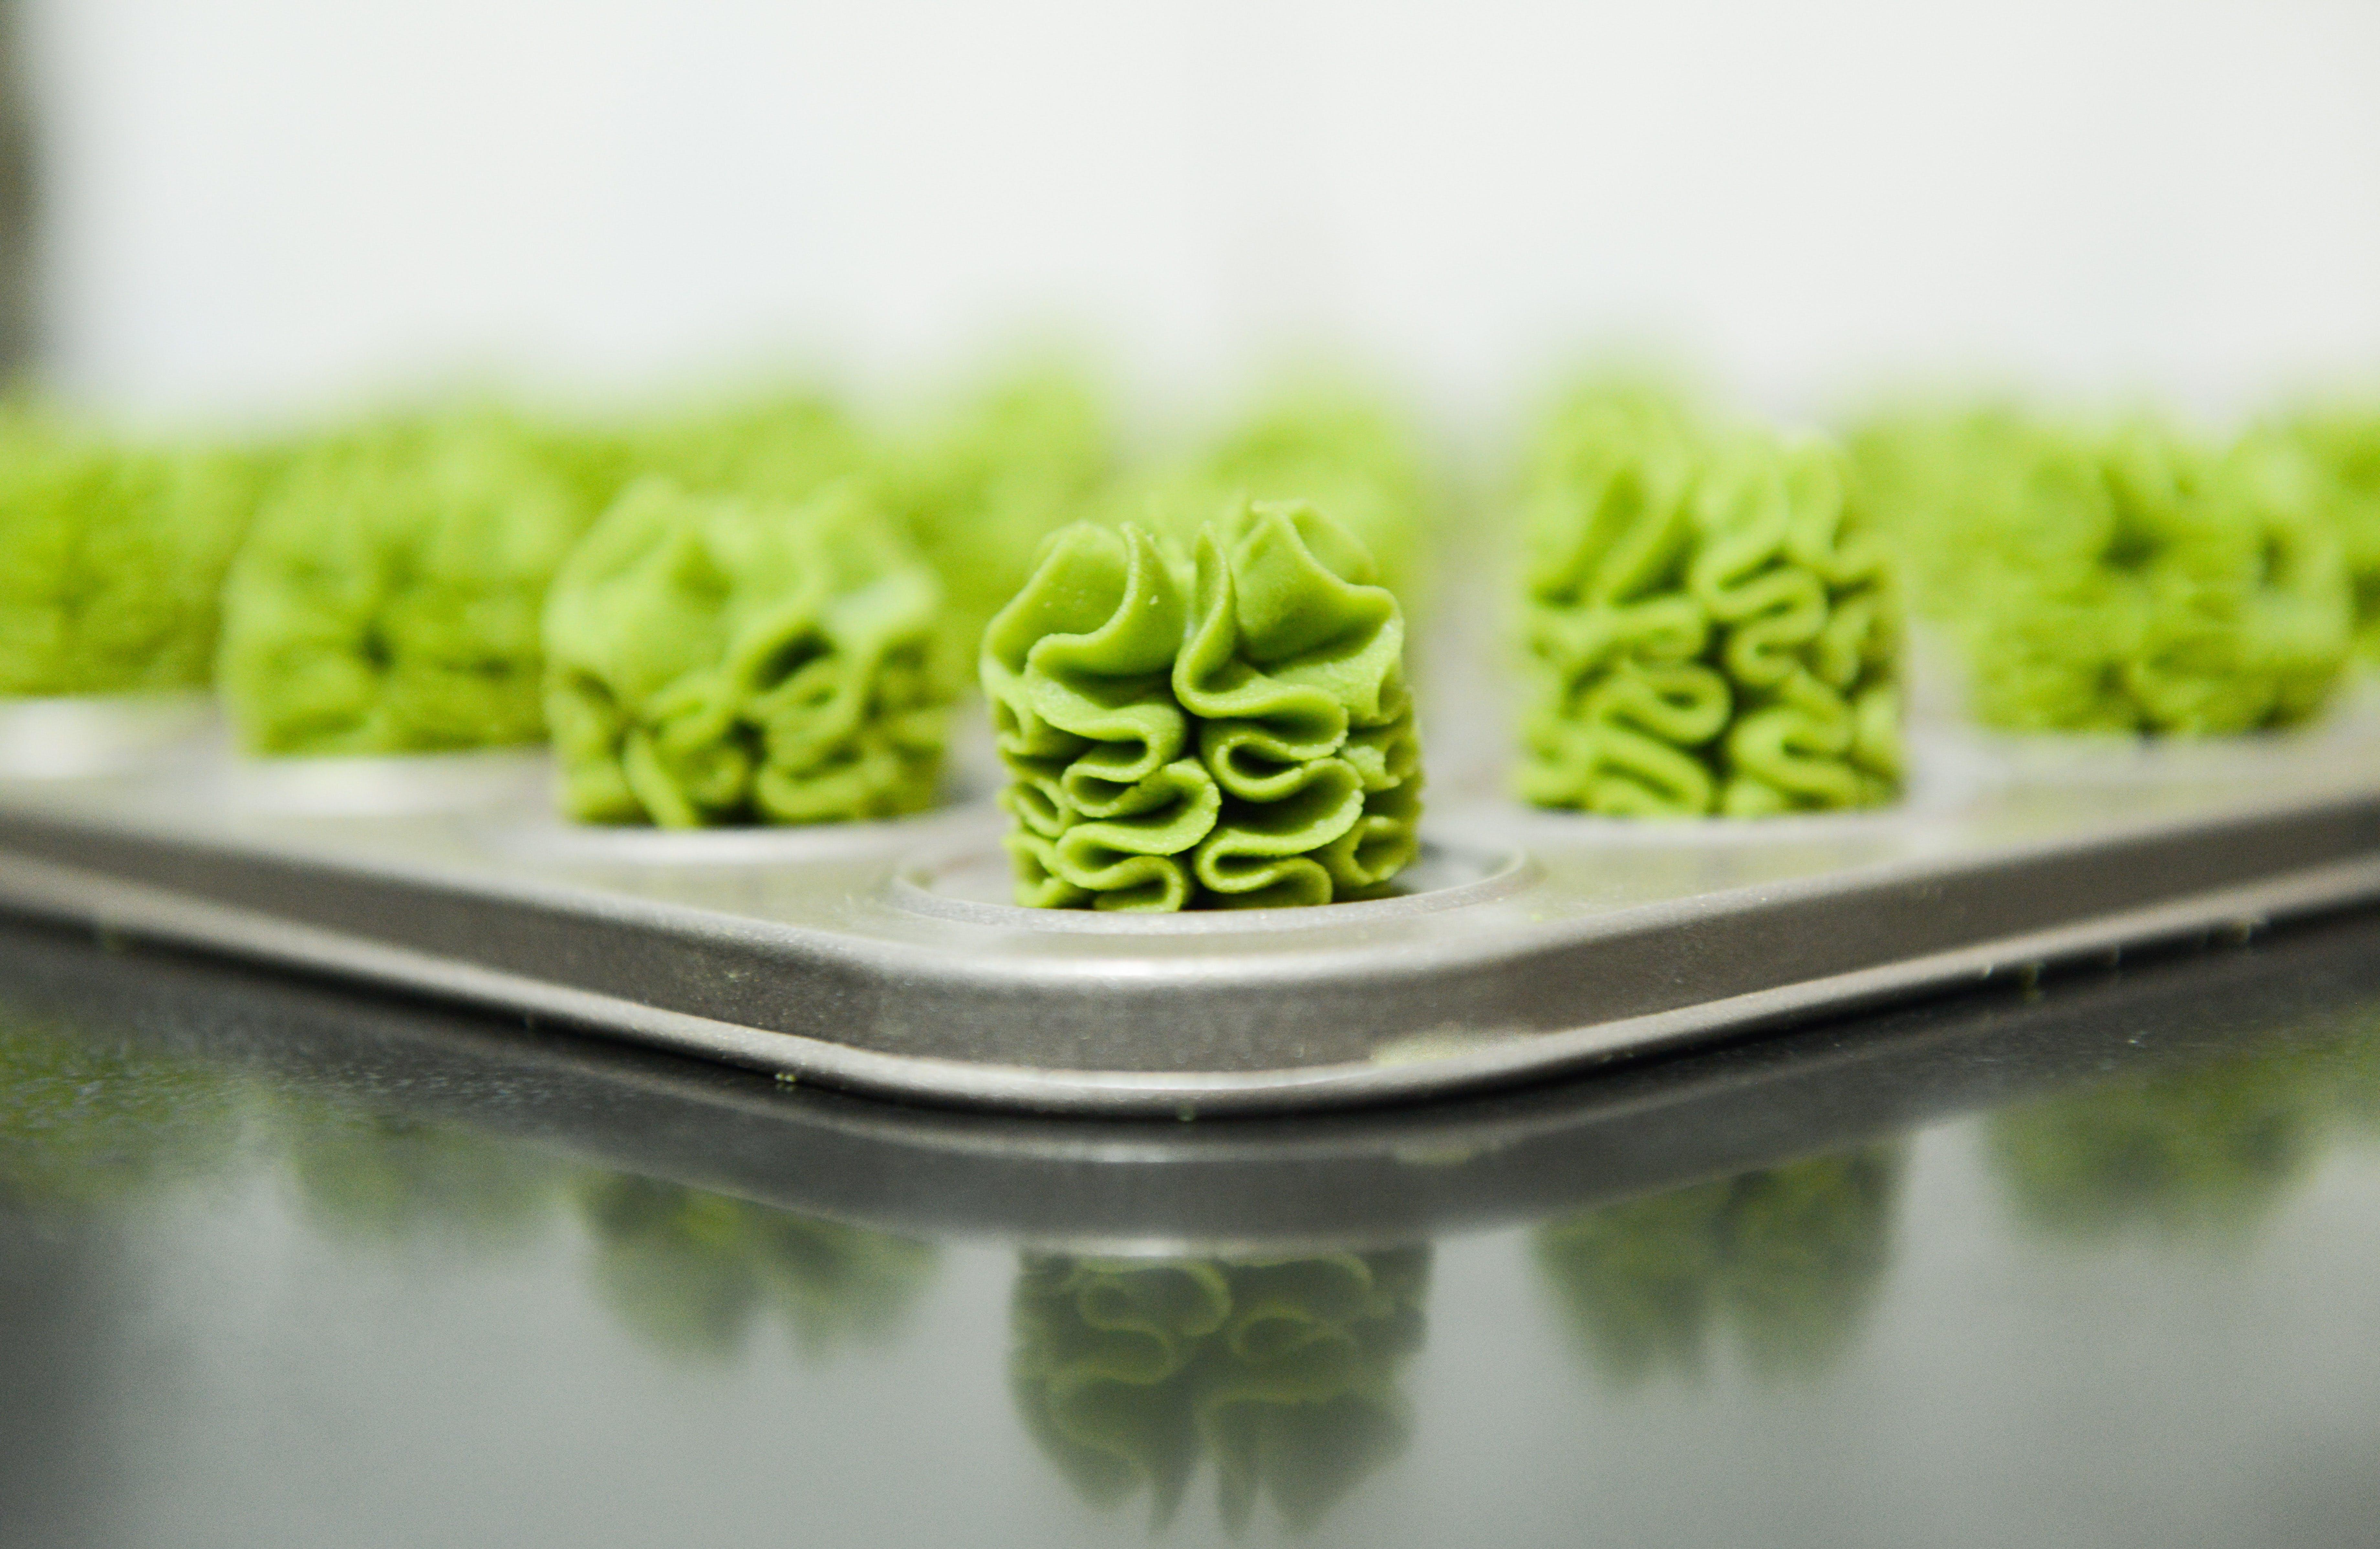 Kostenloses Stock Foto zu kaffee, grün, cookie, matcha